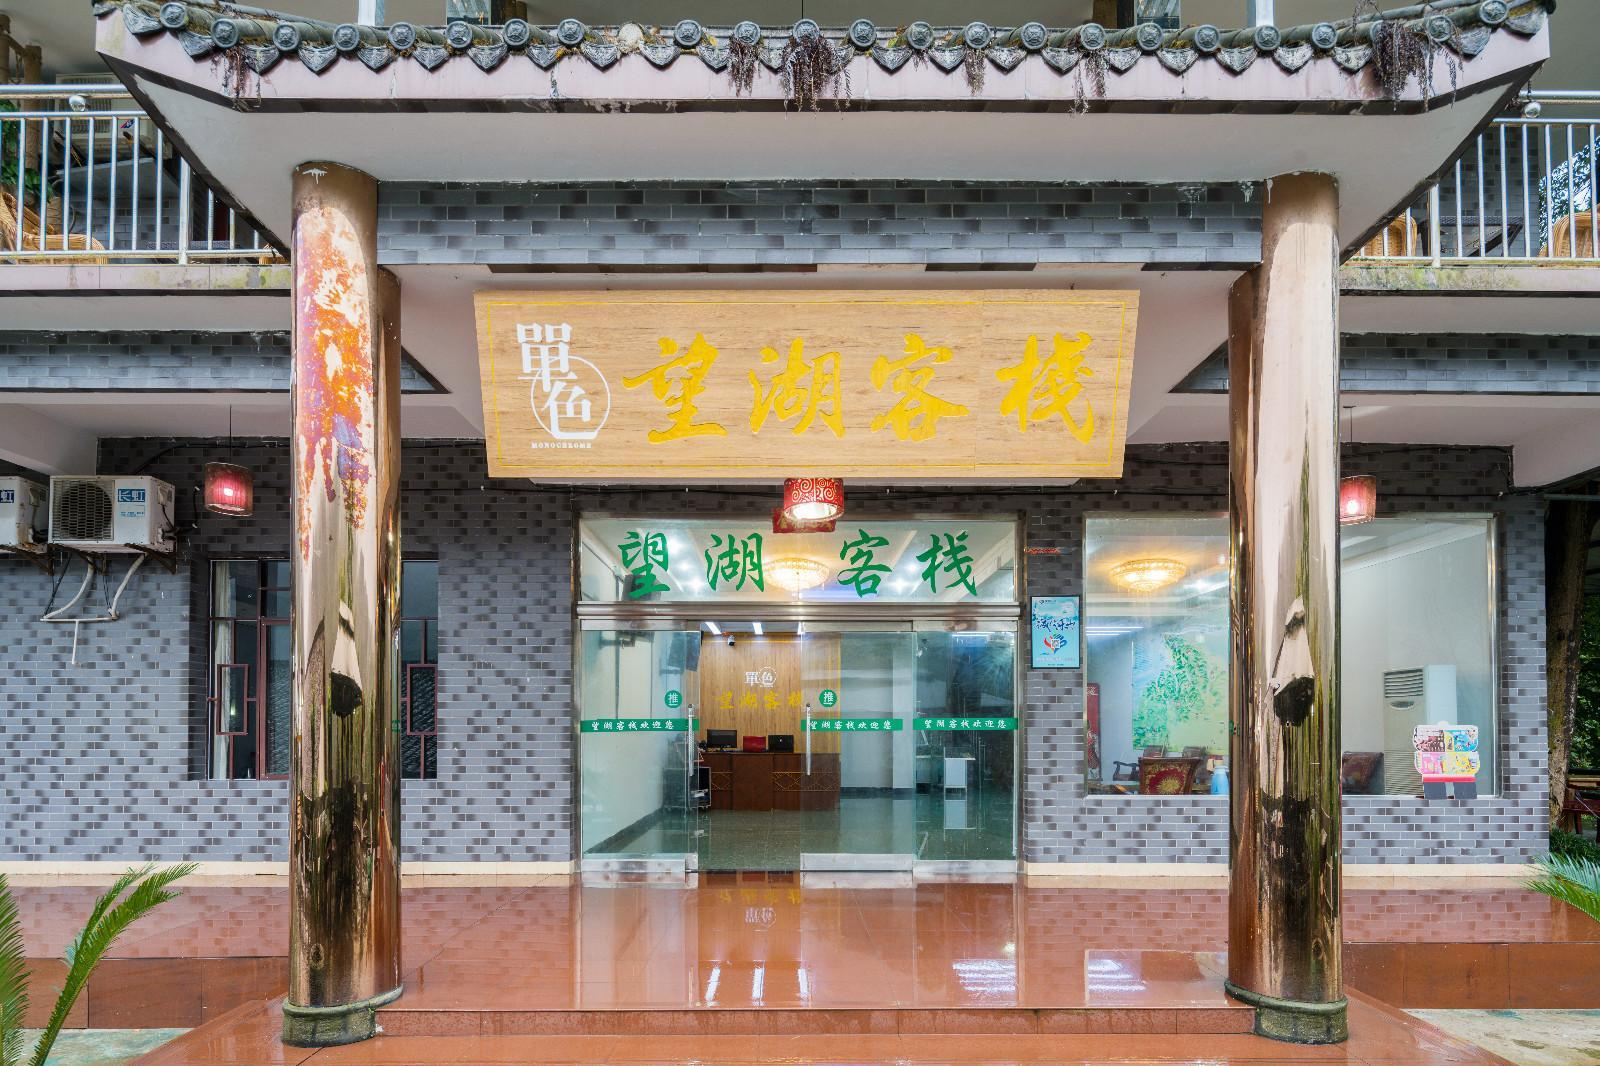 Monochrome Hotel E'mei Mountain Wanghu Inn